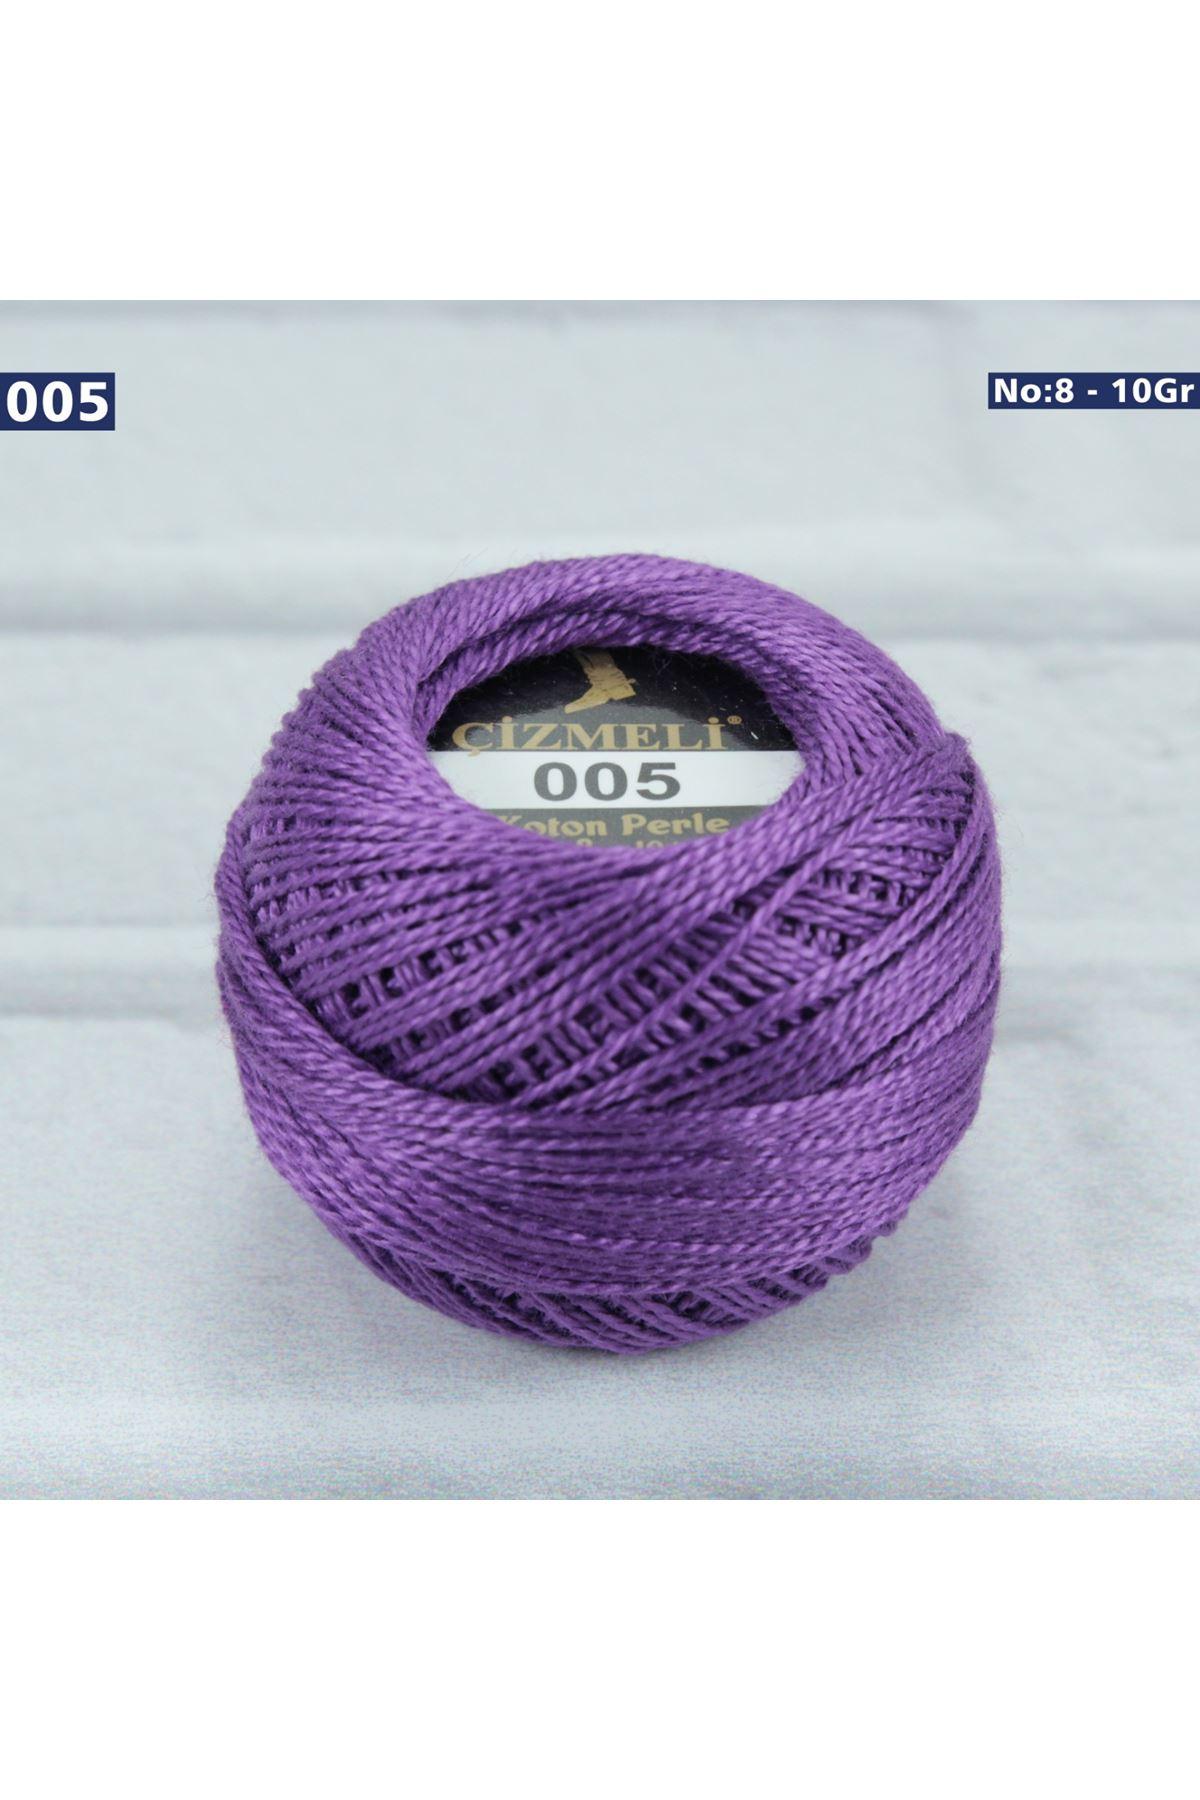 Çizmeli Cotton Perle Nakış İpliği No: 005